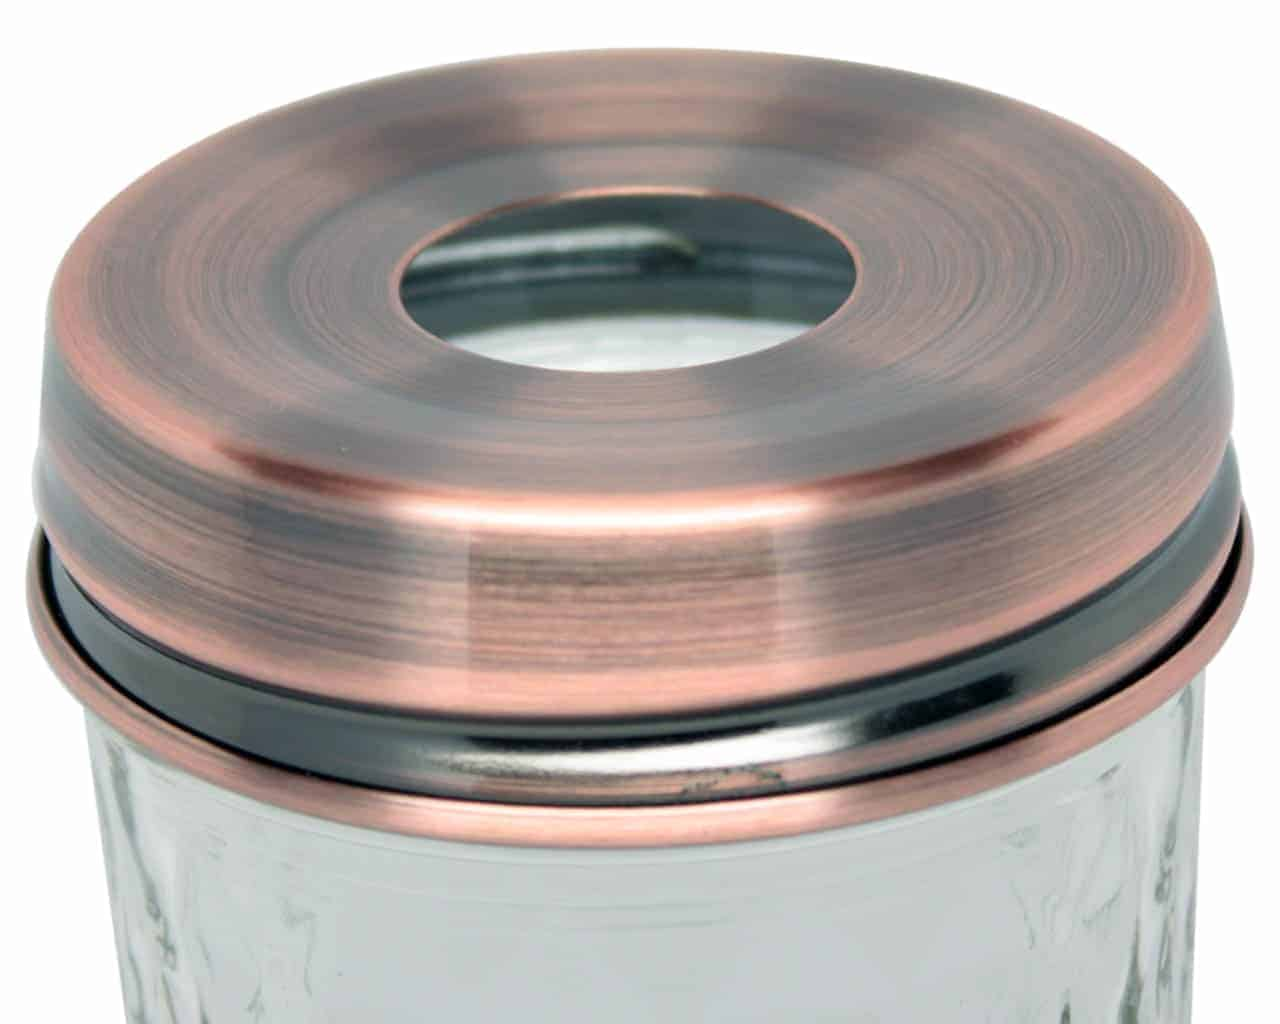 28f60978fe7 ... Dispenser Lid Adapter for Regular Mouth Mason Jars. 🔍. copper-stainless -steel-soap-pump-lid-adapter-regular-